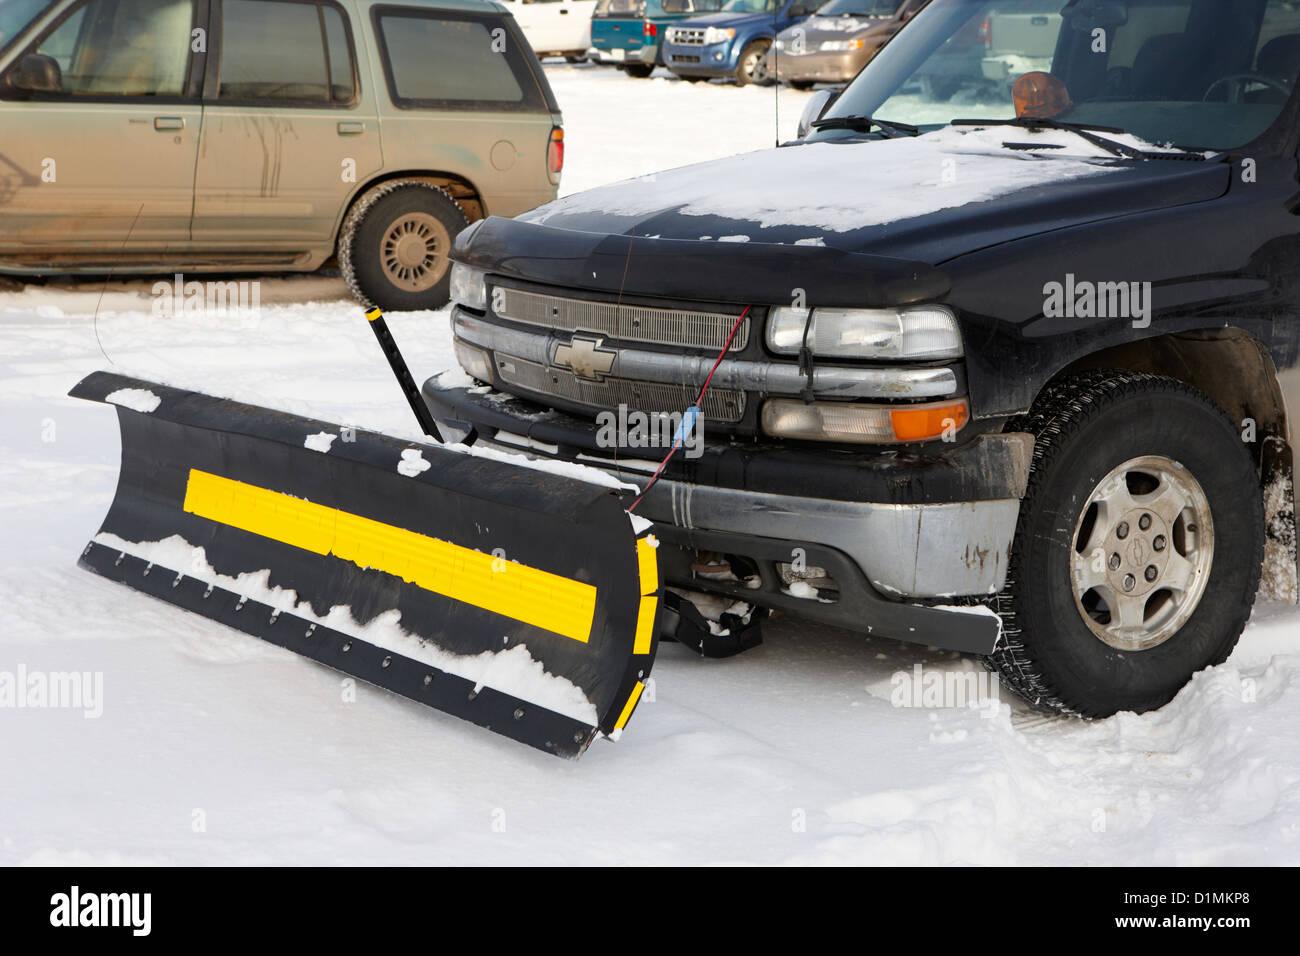 pickup truck fitted with snowplow in car park Saskatoon Saskatchewan Canada - Stock Image